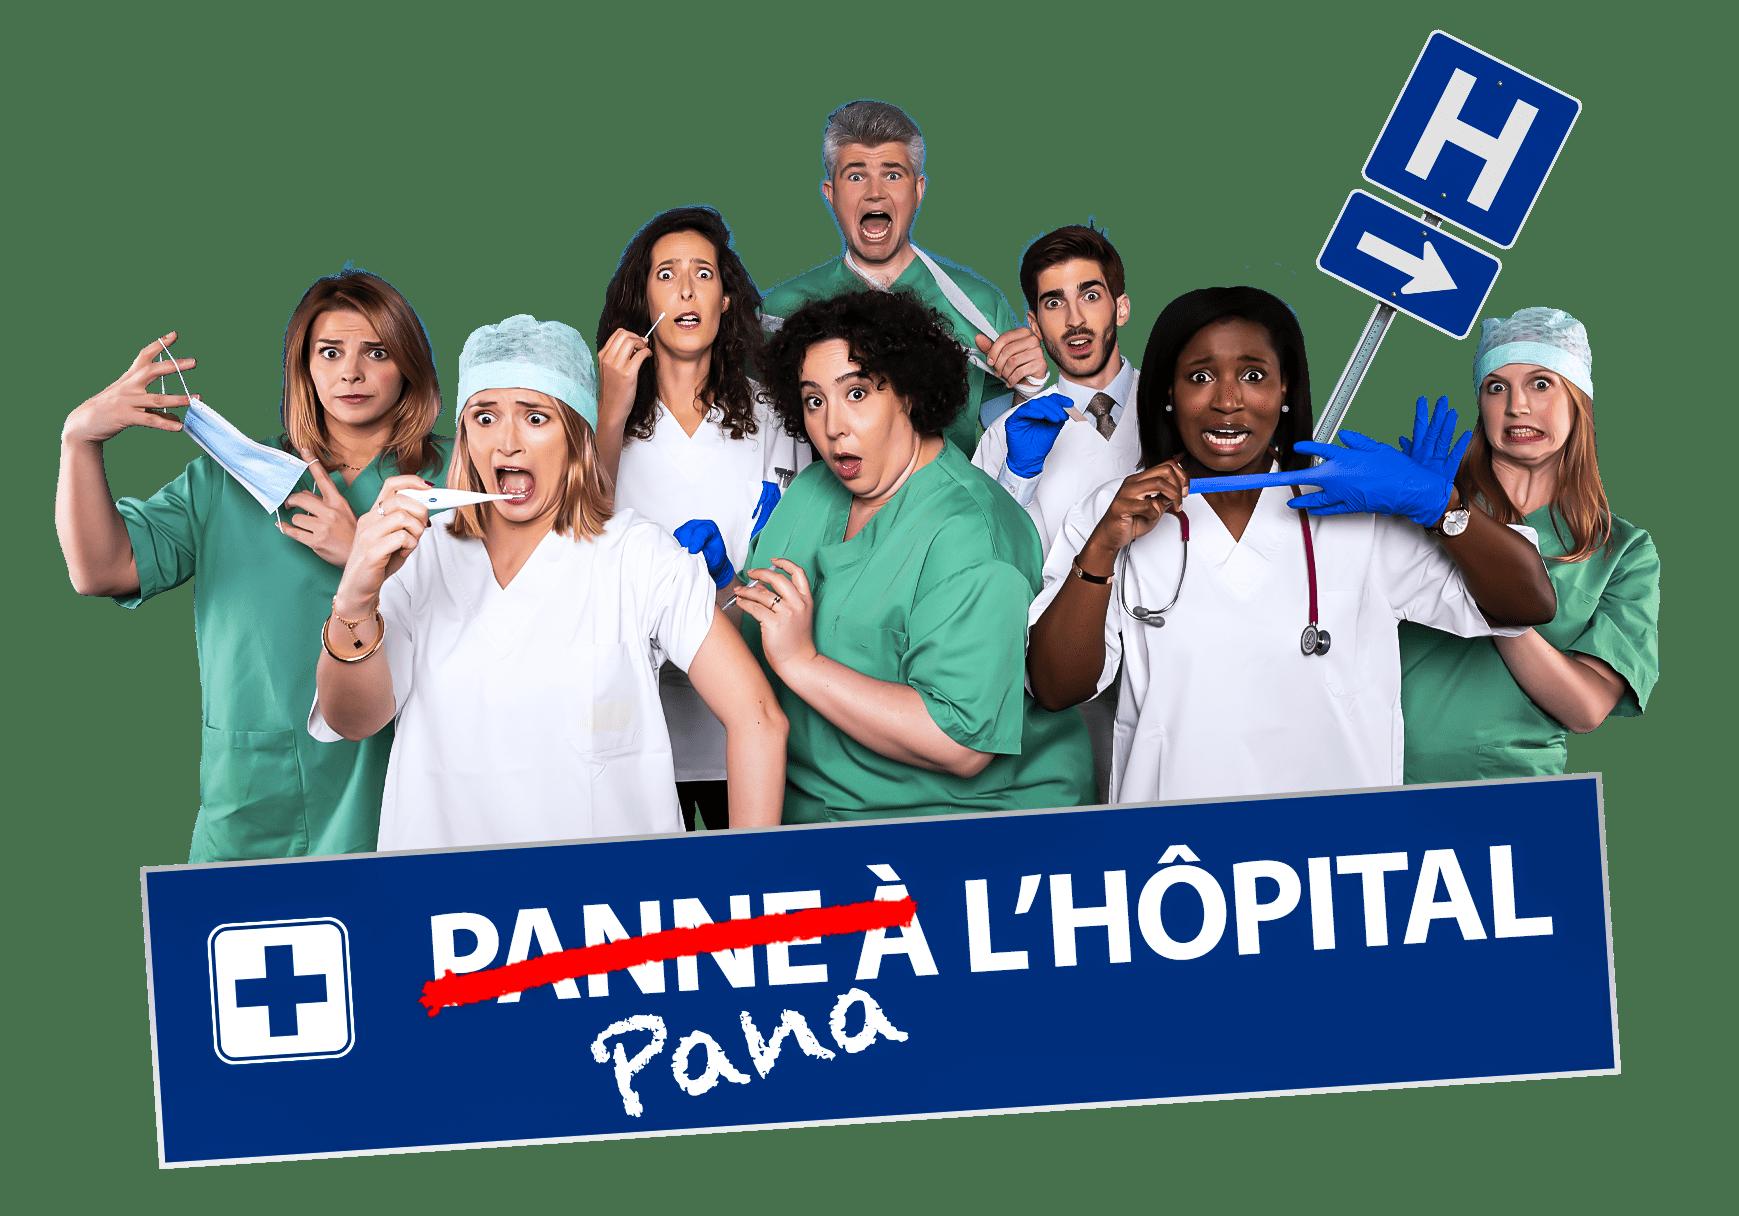 Pana l'hôpital !